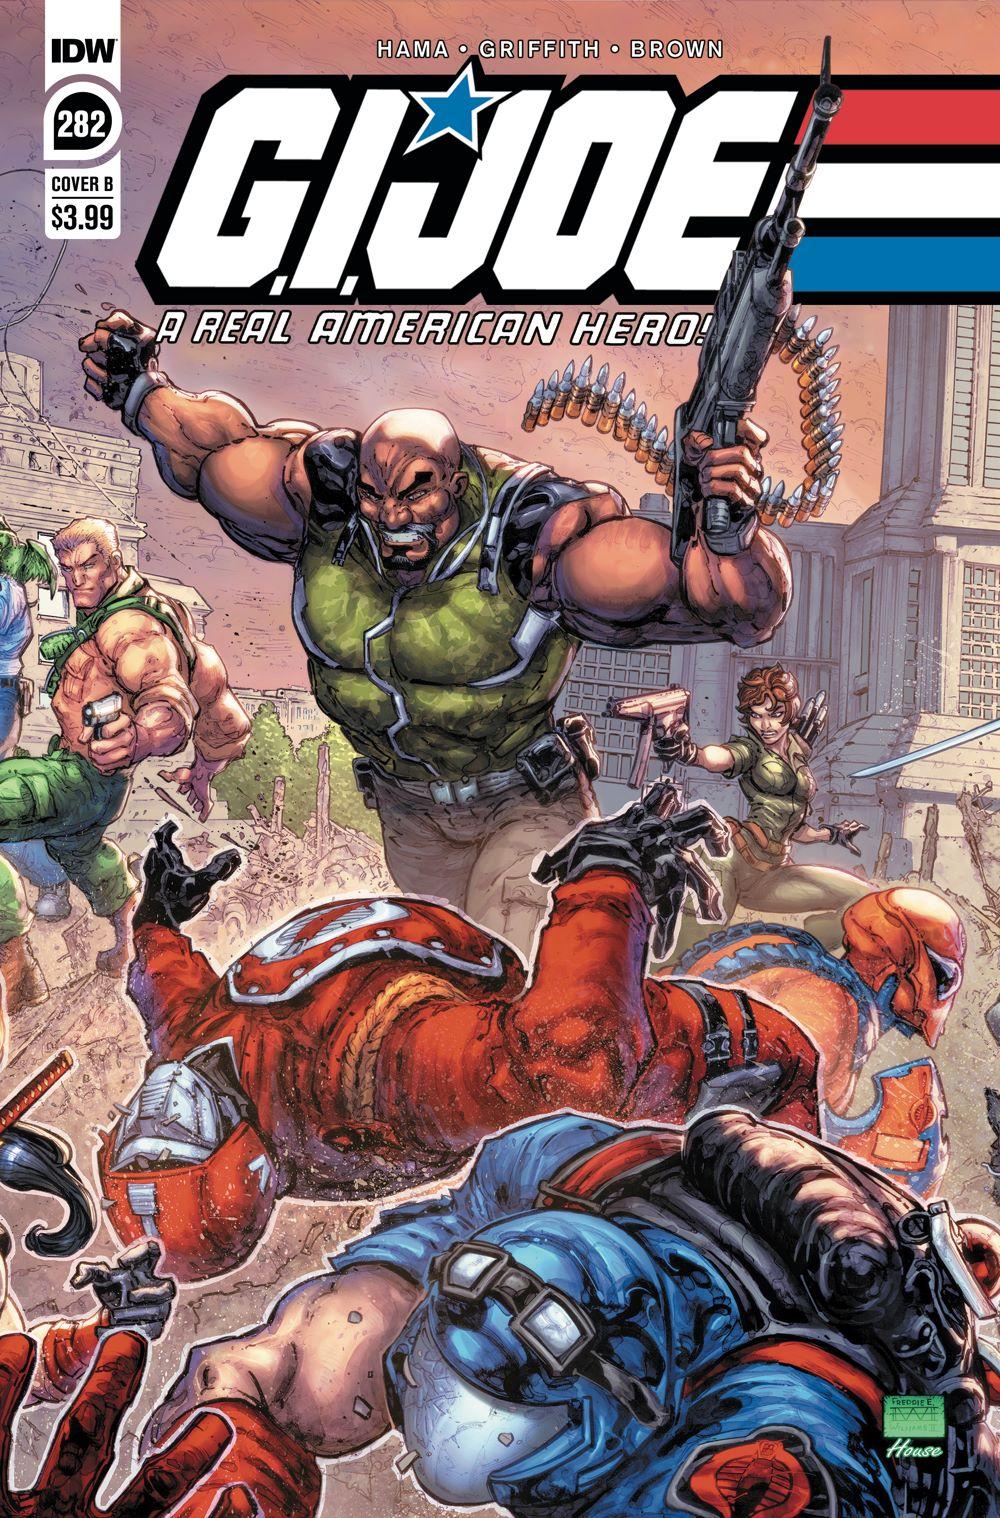 GIJoeRAH282-coverB ComicList Previews: G.I. JOE A REAL AMERICAN HERO #282